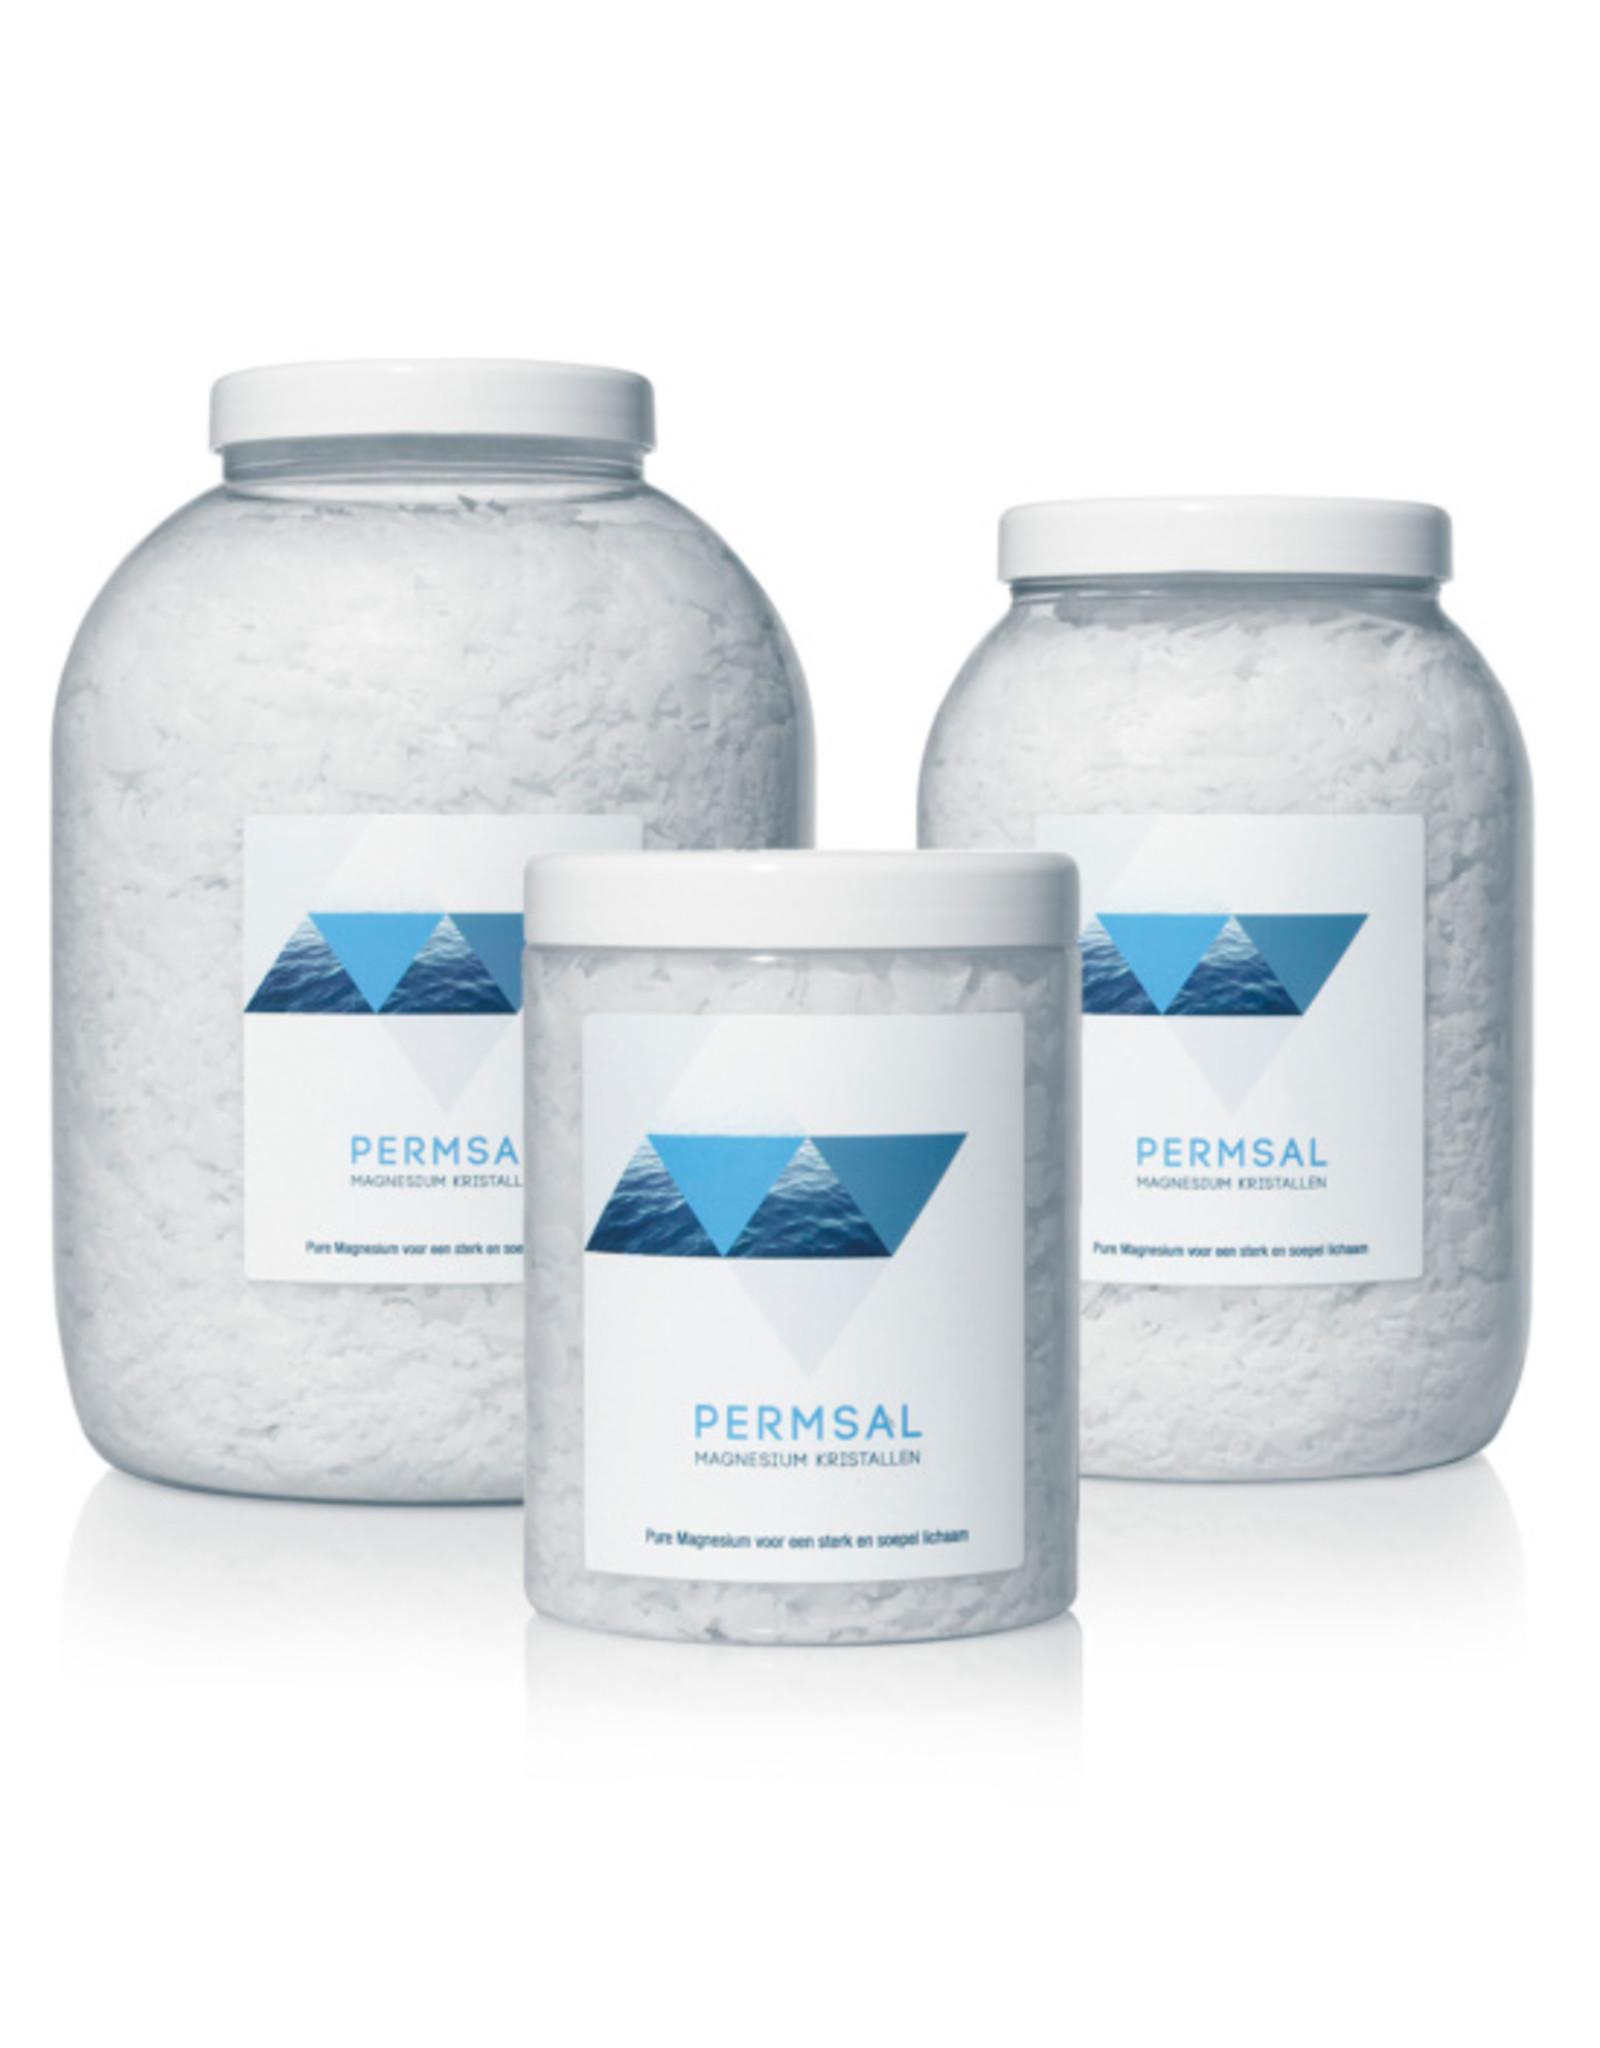 Permsal Magnesium kristallen/vlokken 4 kilo - Body & Soap